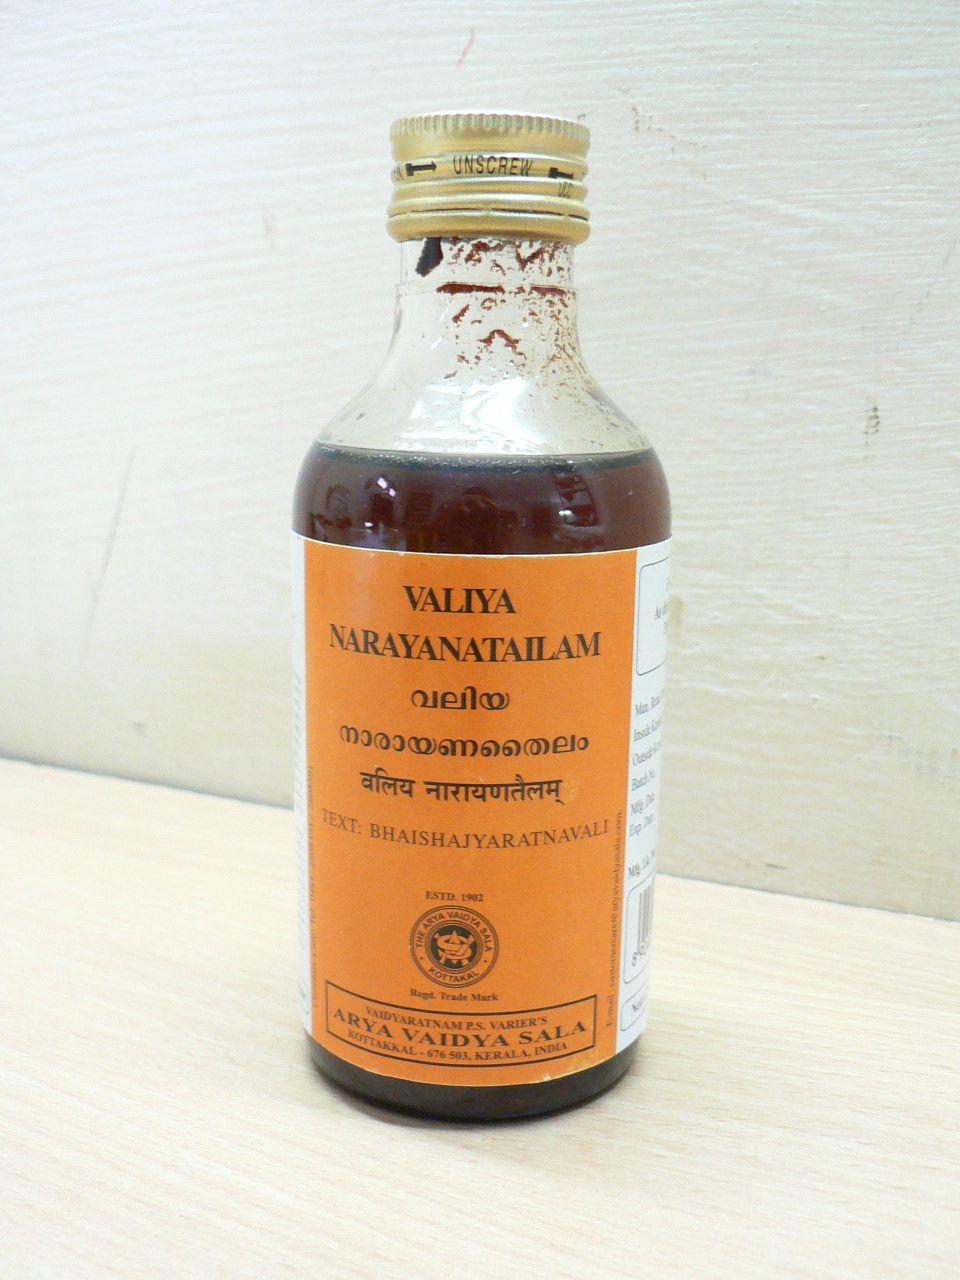 <b>MAHANARAYANA TAILAM</B><BR>MAHANARAYANA THAILAM<BR>AVS - 200 ml